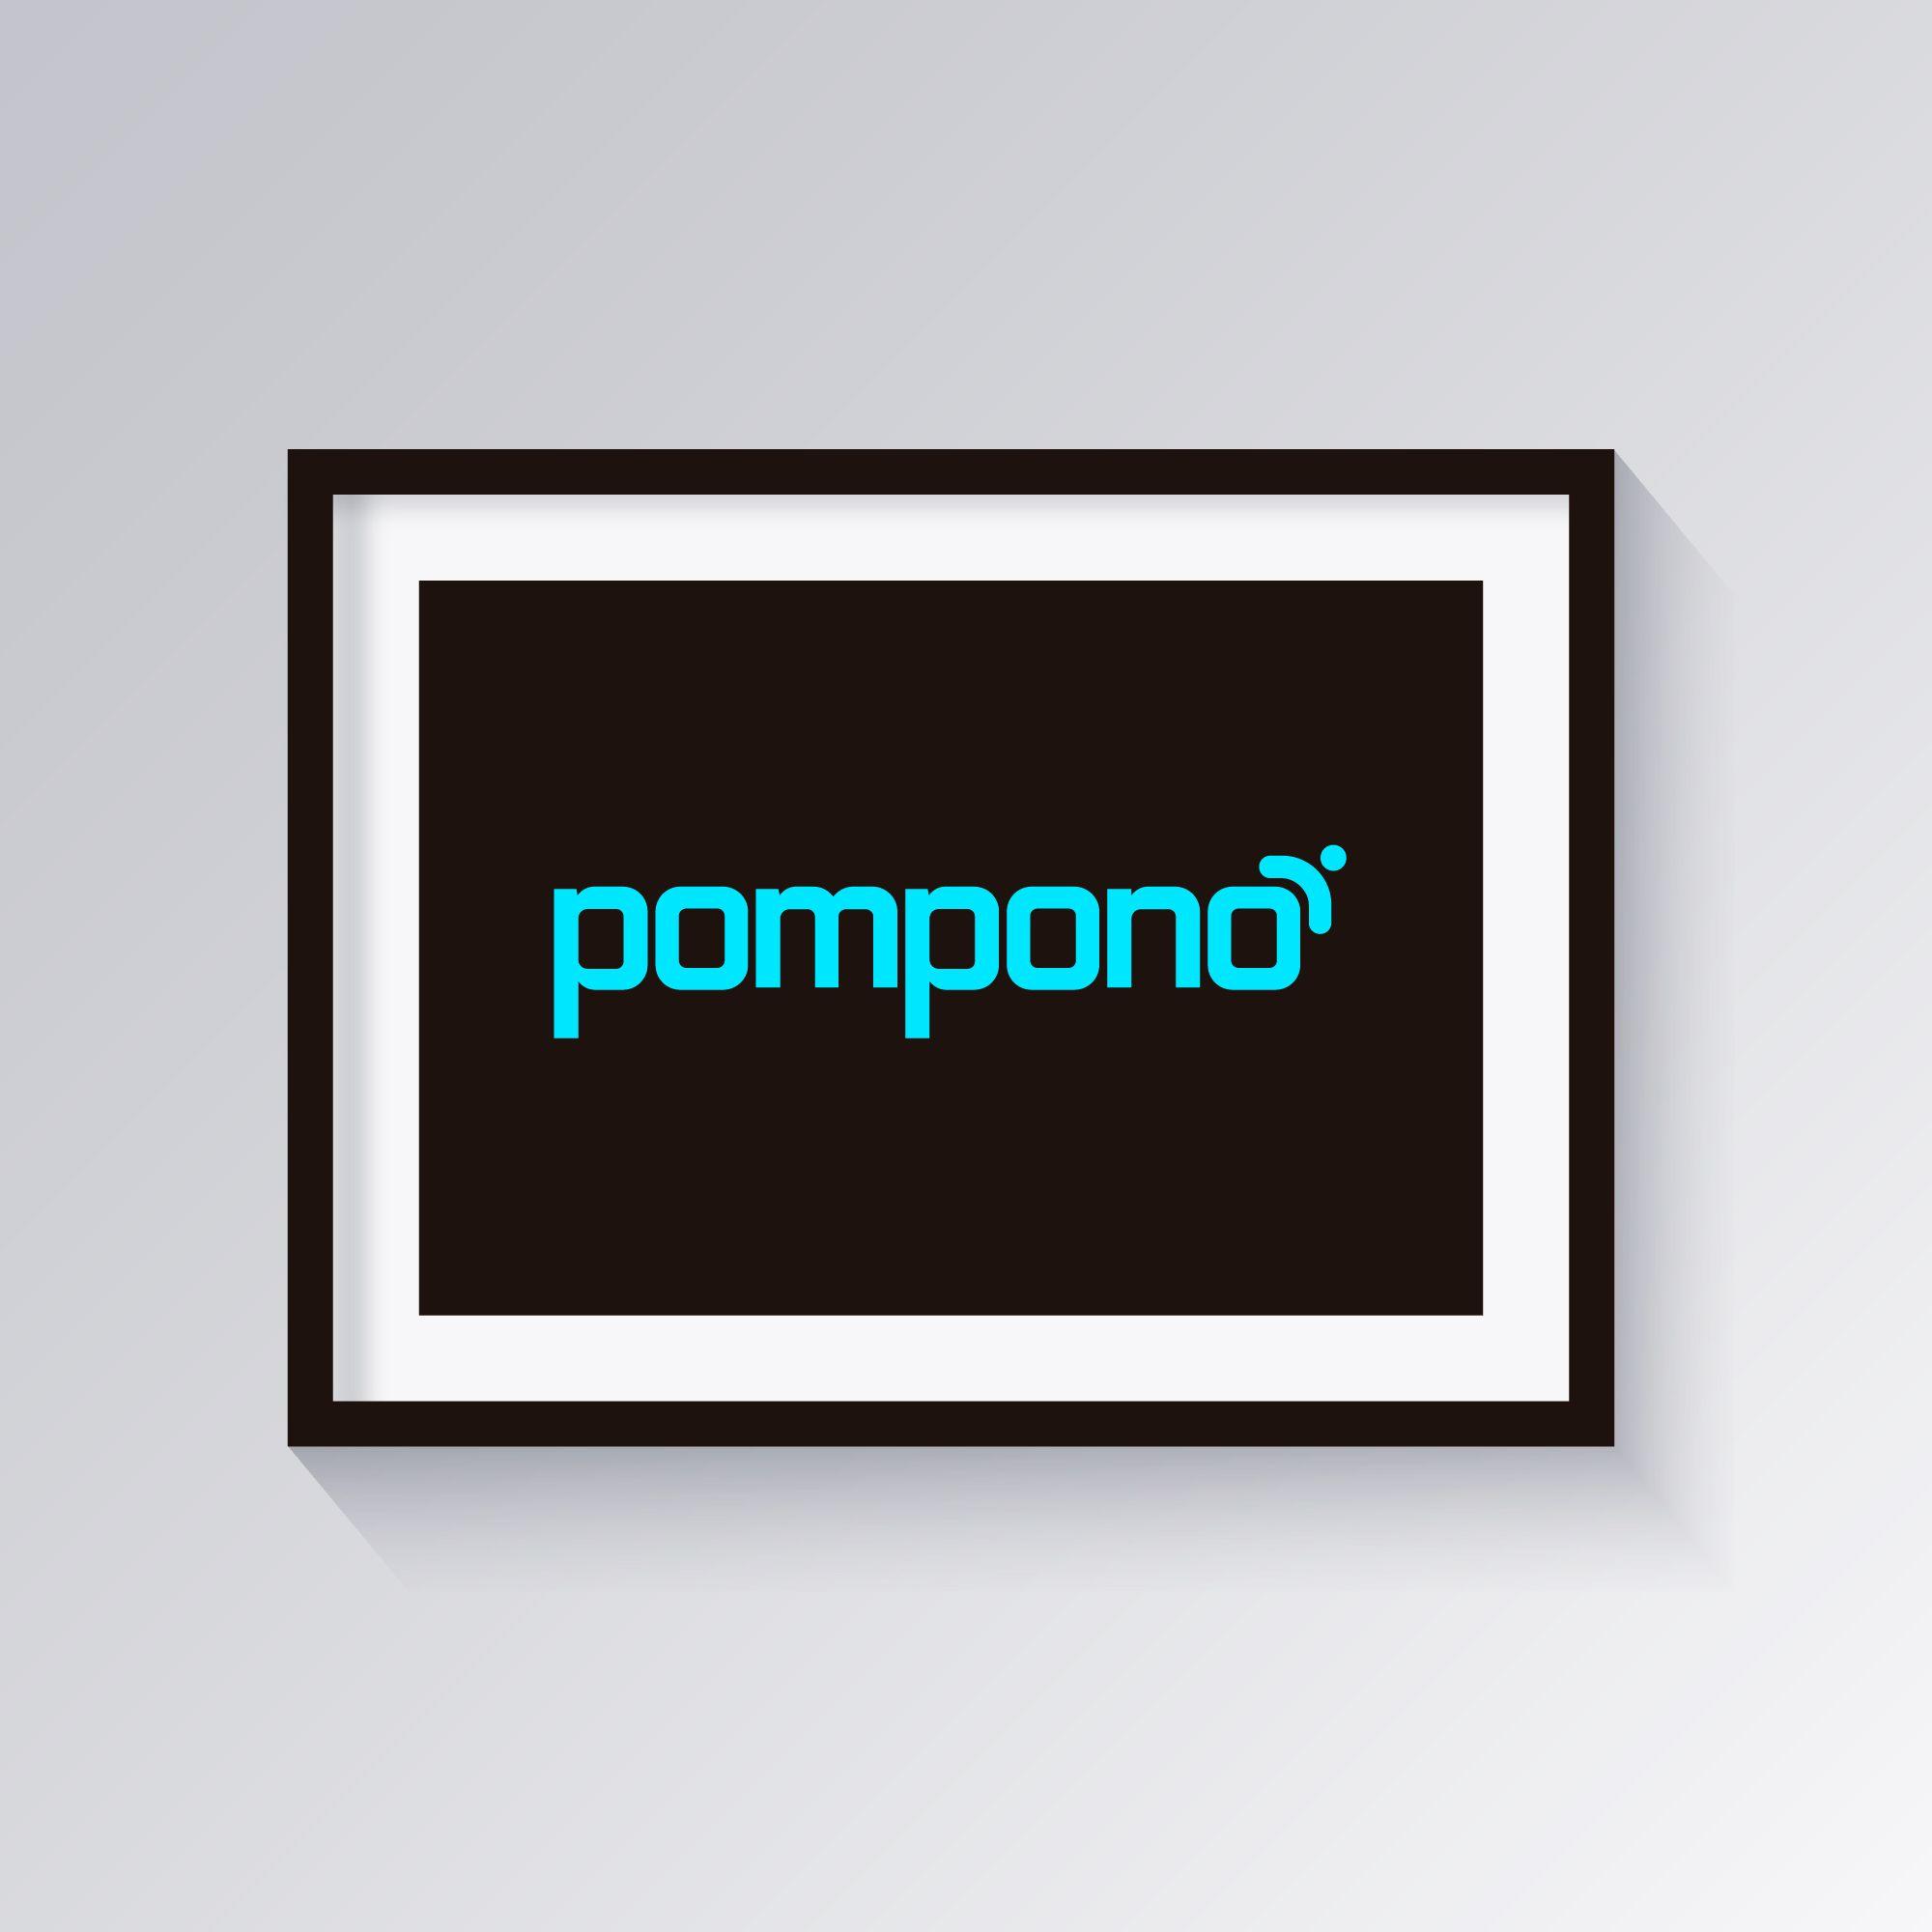 Логотип для шапок Pompono - дизайнер alexchexes